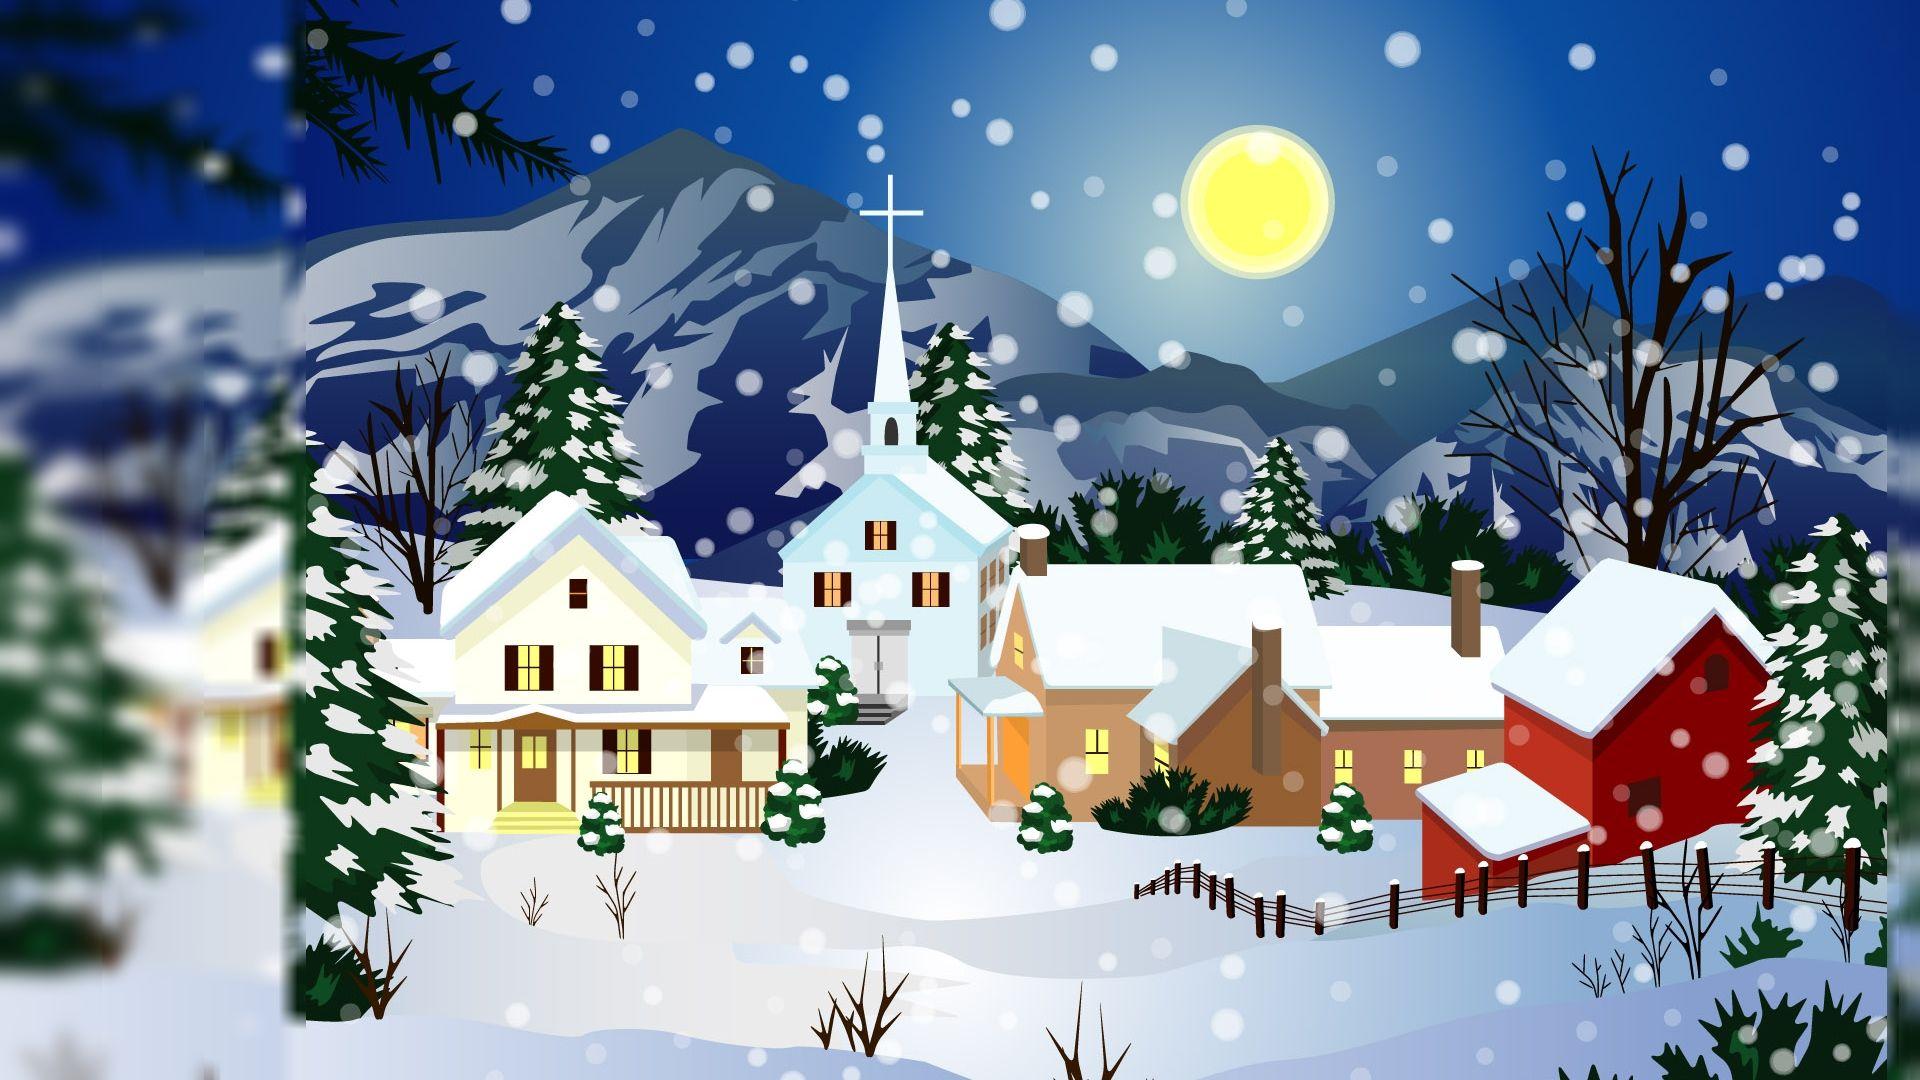 Bing Christmas Wall Paper Gallery 1080 Christmas